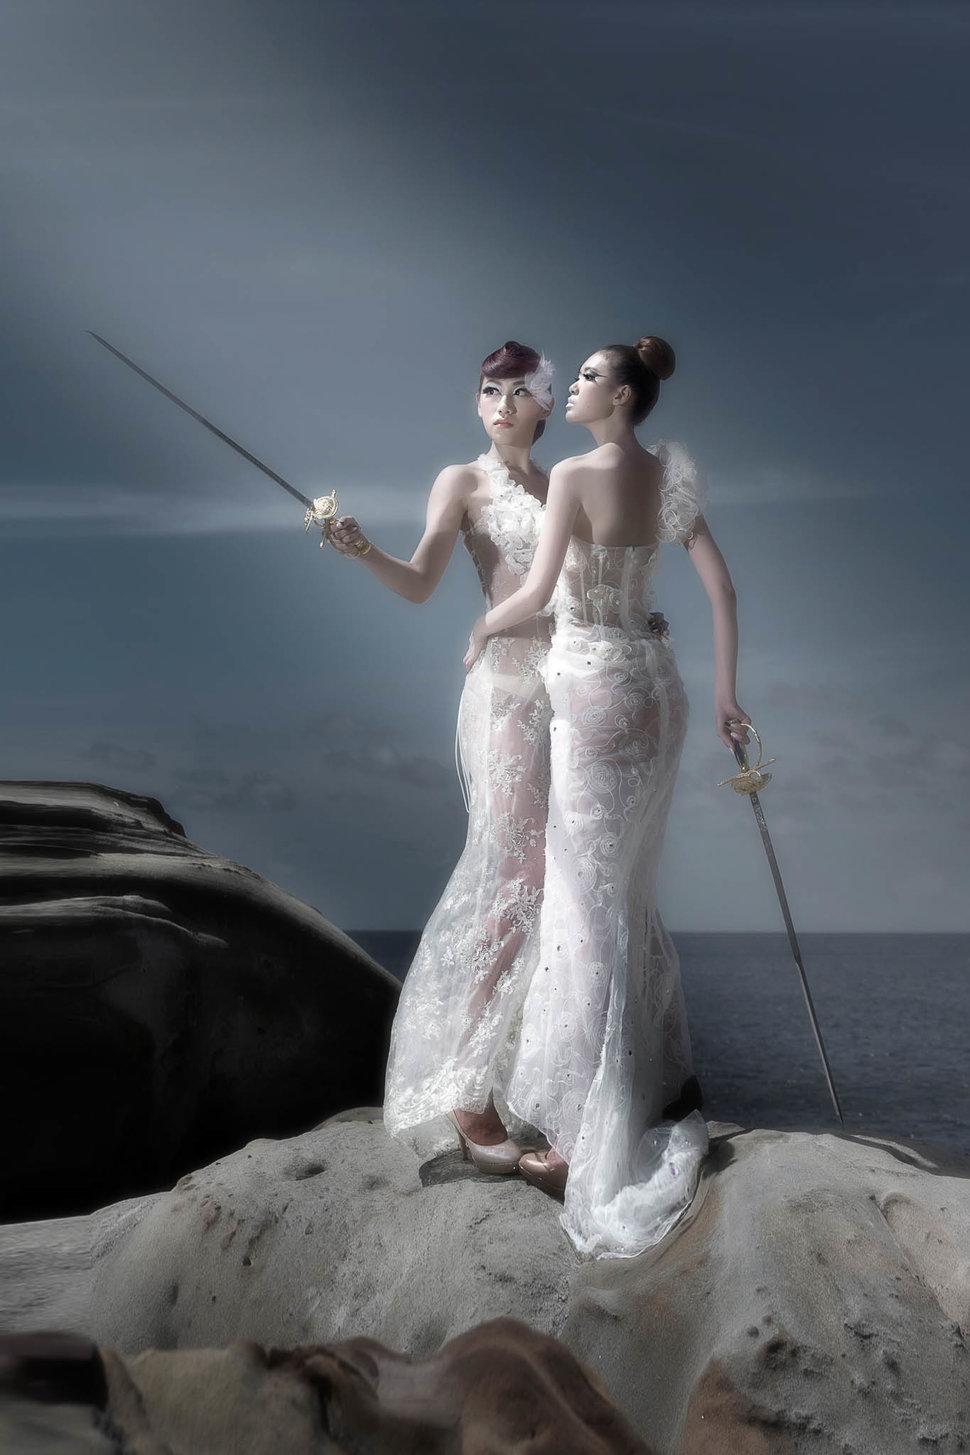 18PHOTO自主婚紗-自信與優雅的征服(編號:214902) - 18PHOTO 婚紗影像攝影工作室 - 結婚吧一站式婚禮服務平台